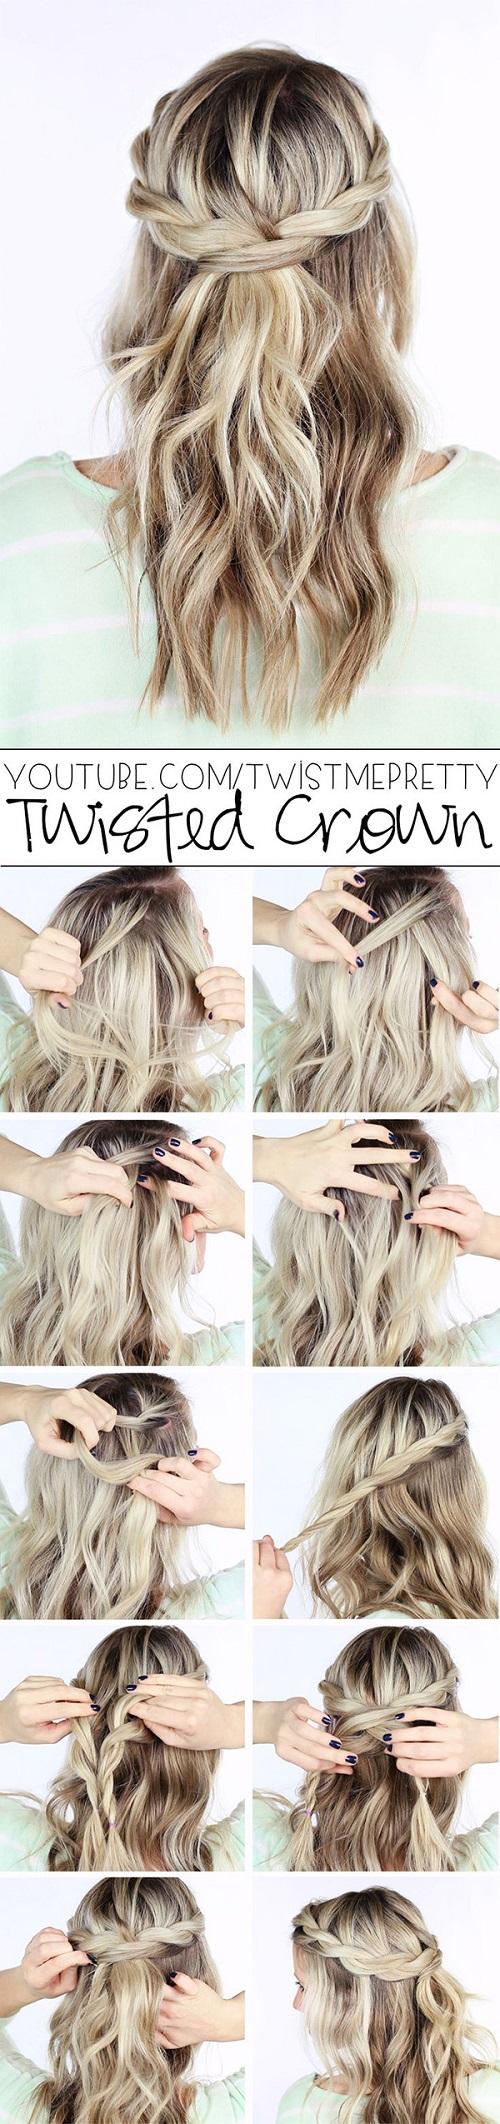 17 hair tutorials you can totally diy